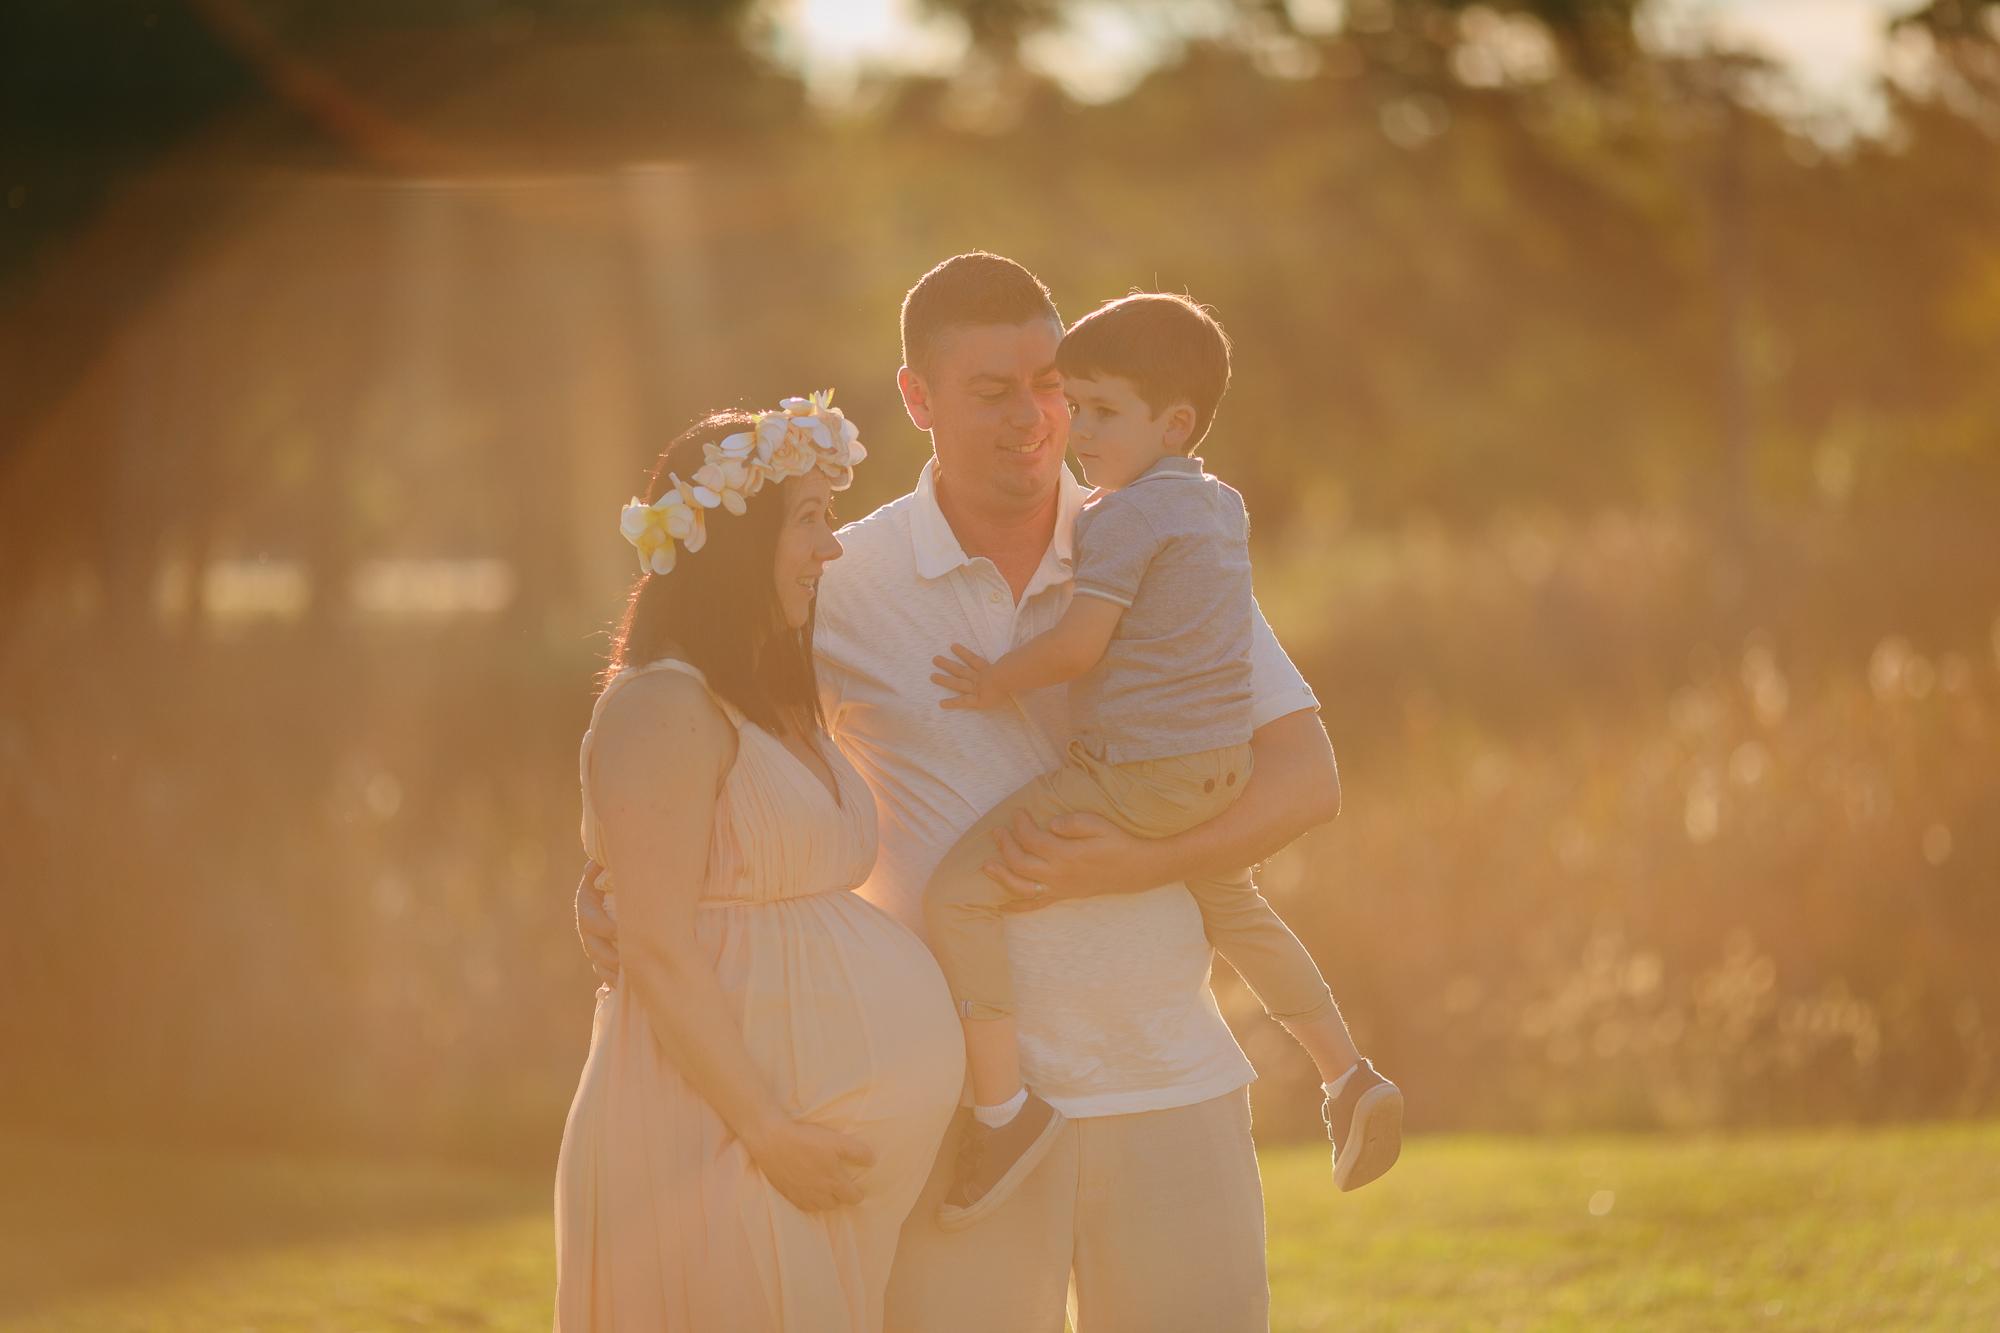 056_Maternity Lifetsyle_Shelley_Sunlight Photography.JPG